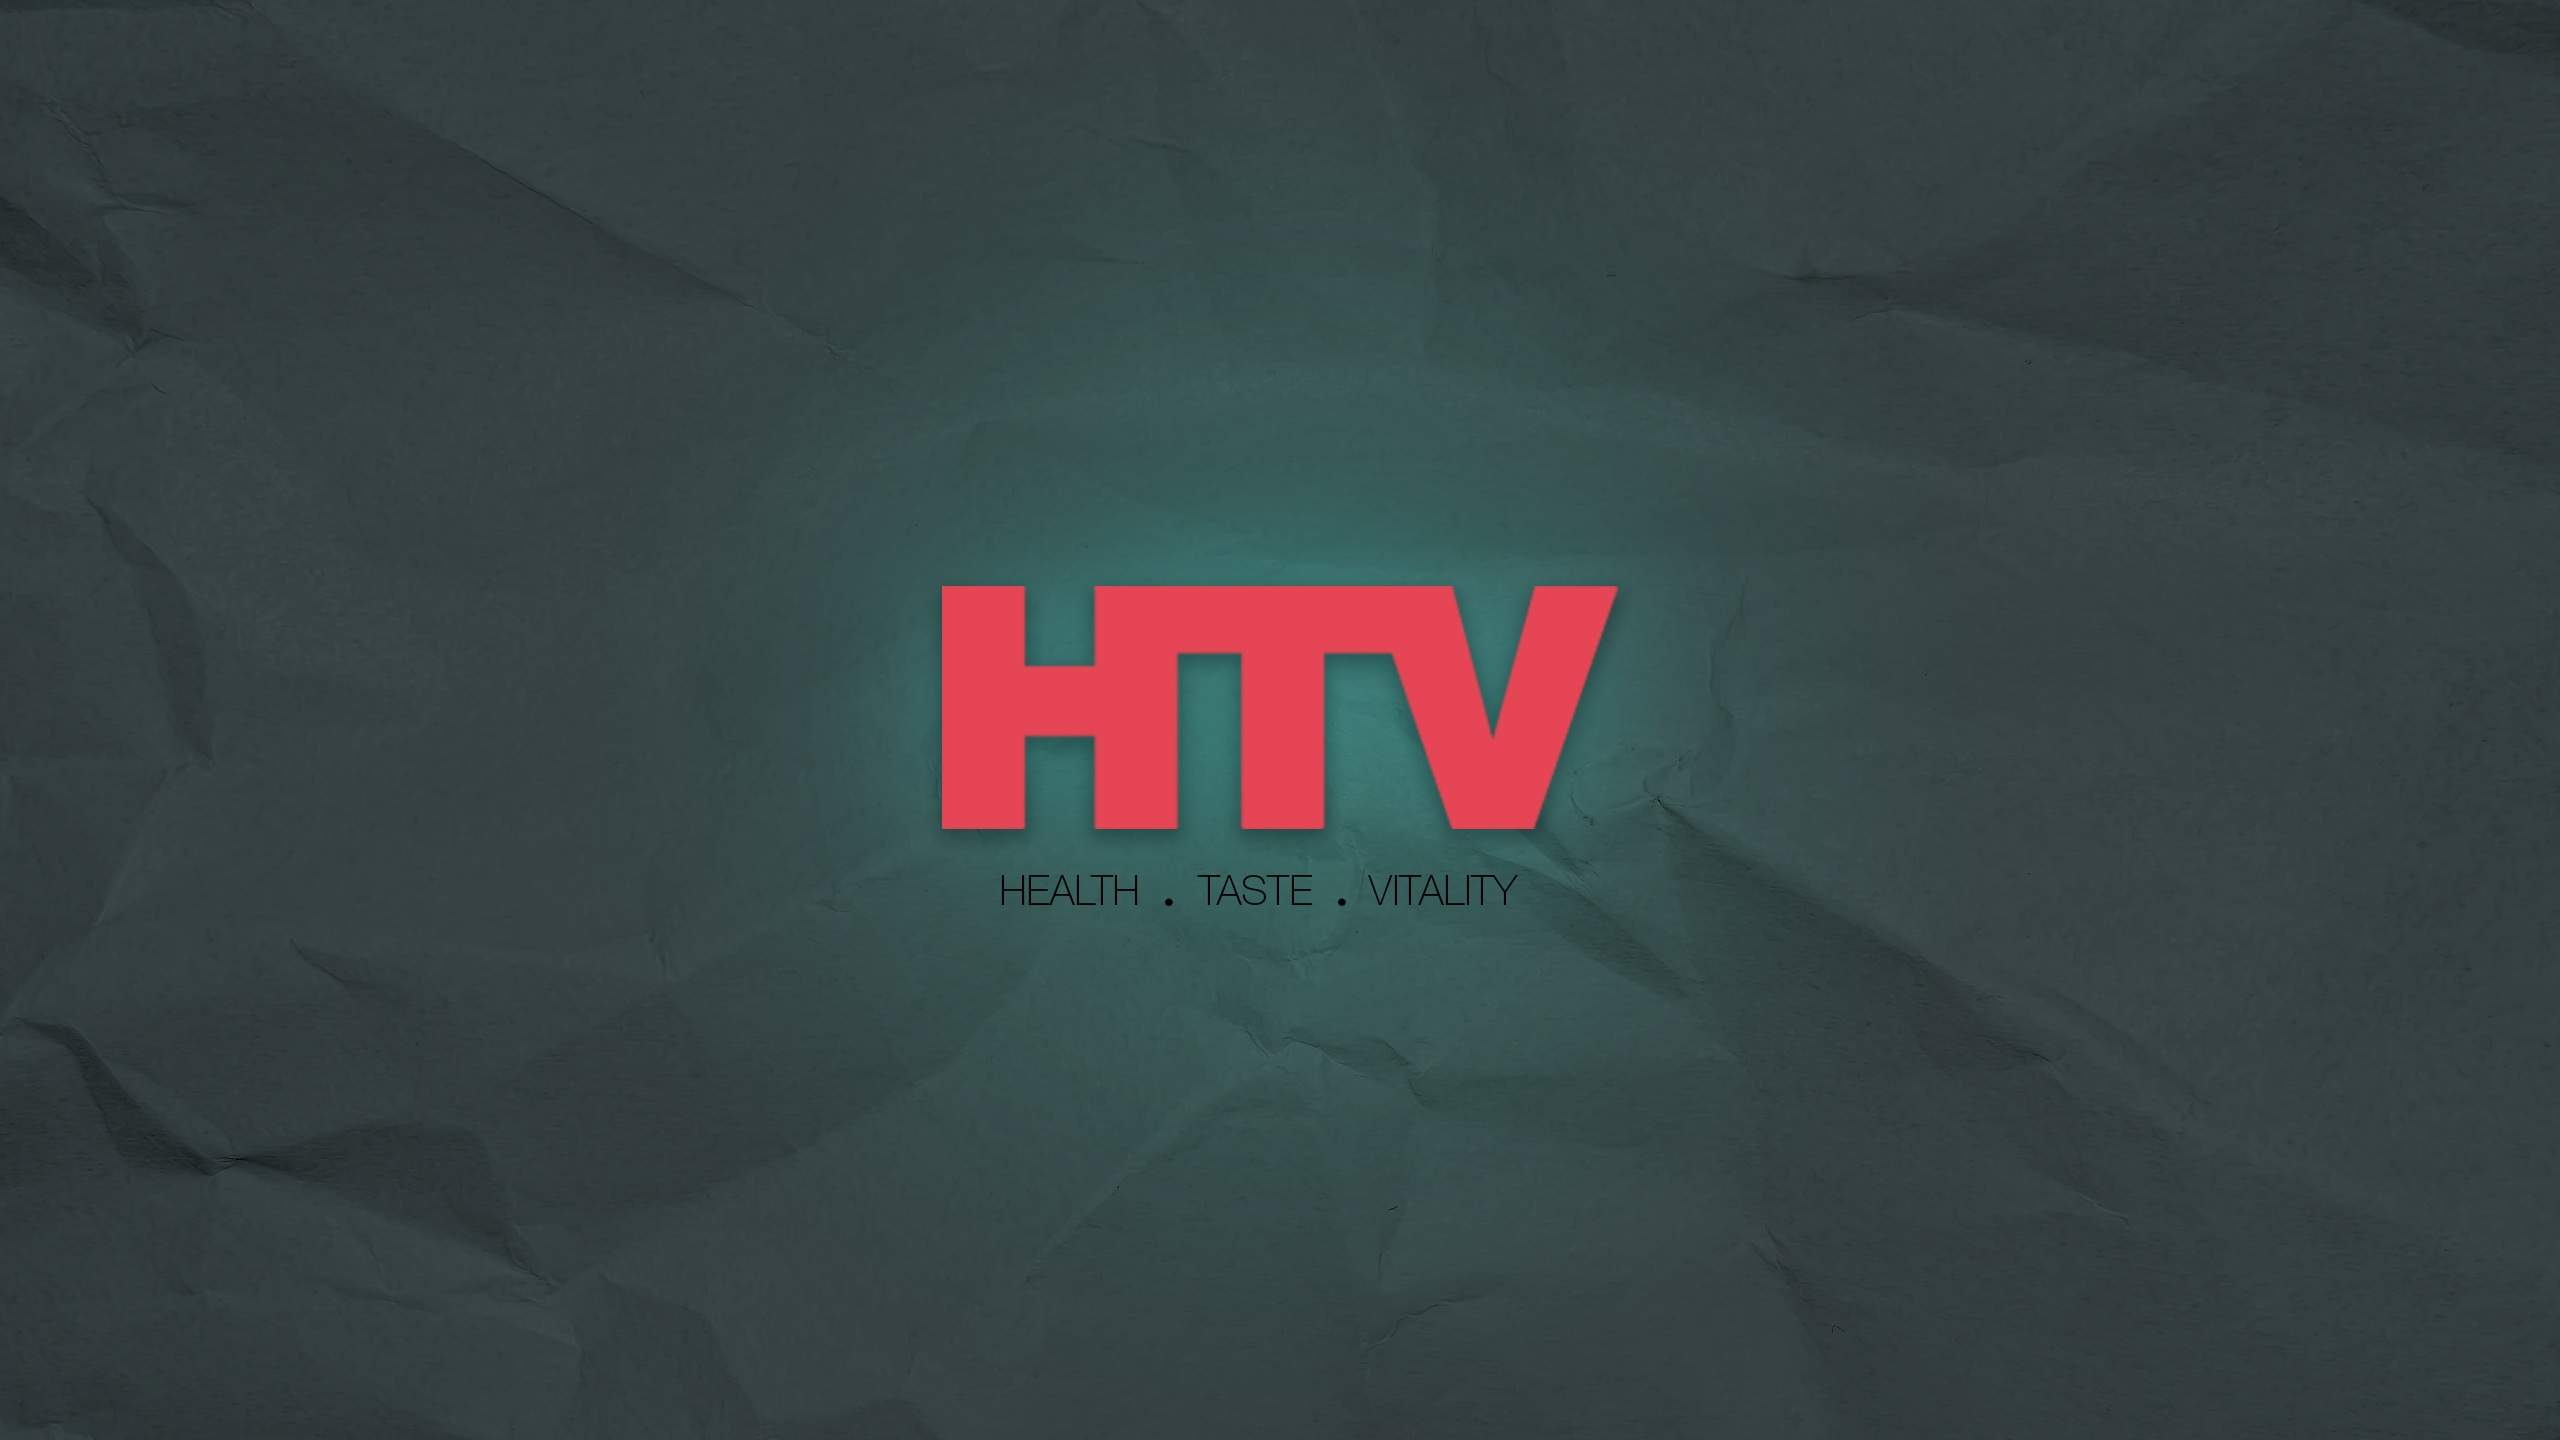 Free Daily Horoscope Astrology - HTV